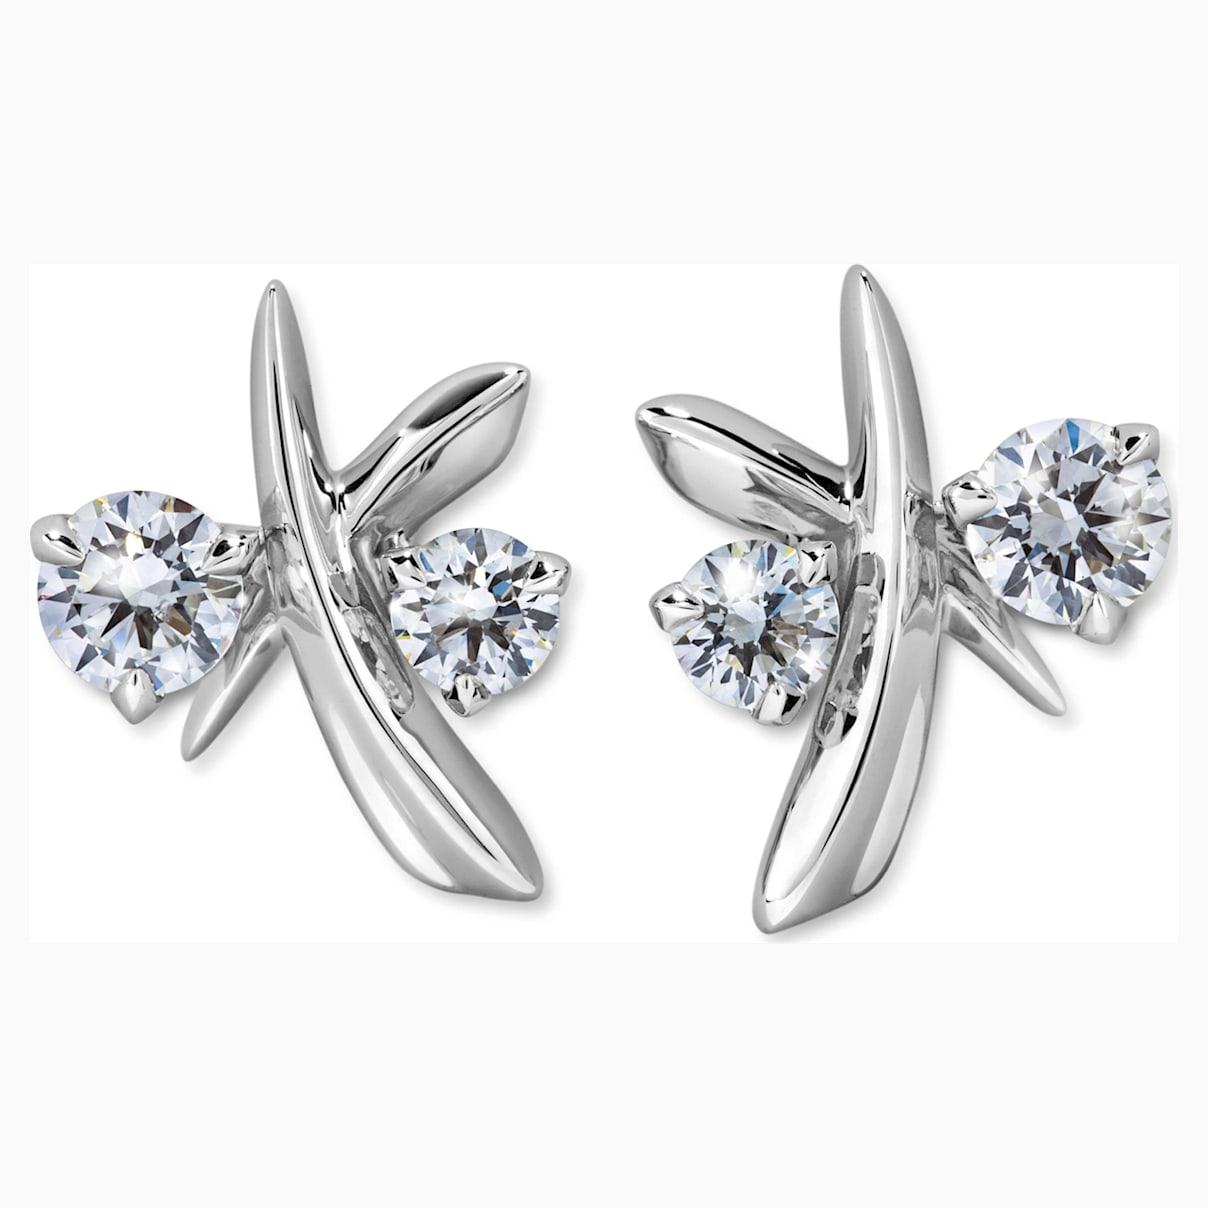 Encounter Stud Earrings, Swarovski Created Diamonds, 18K White Gold